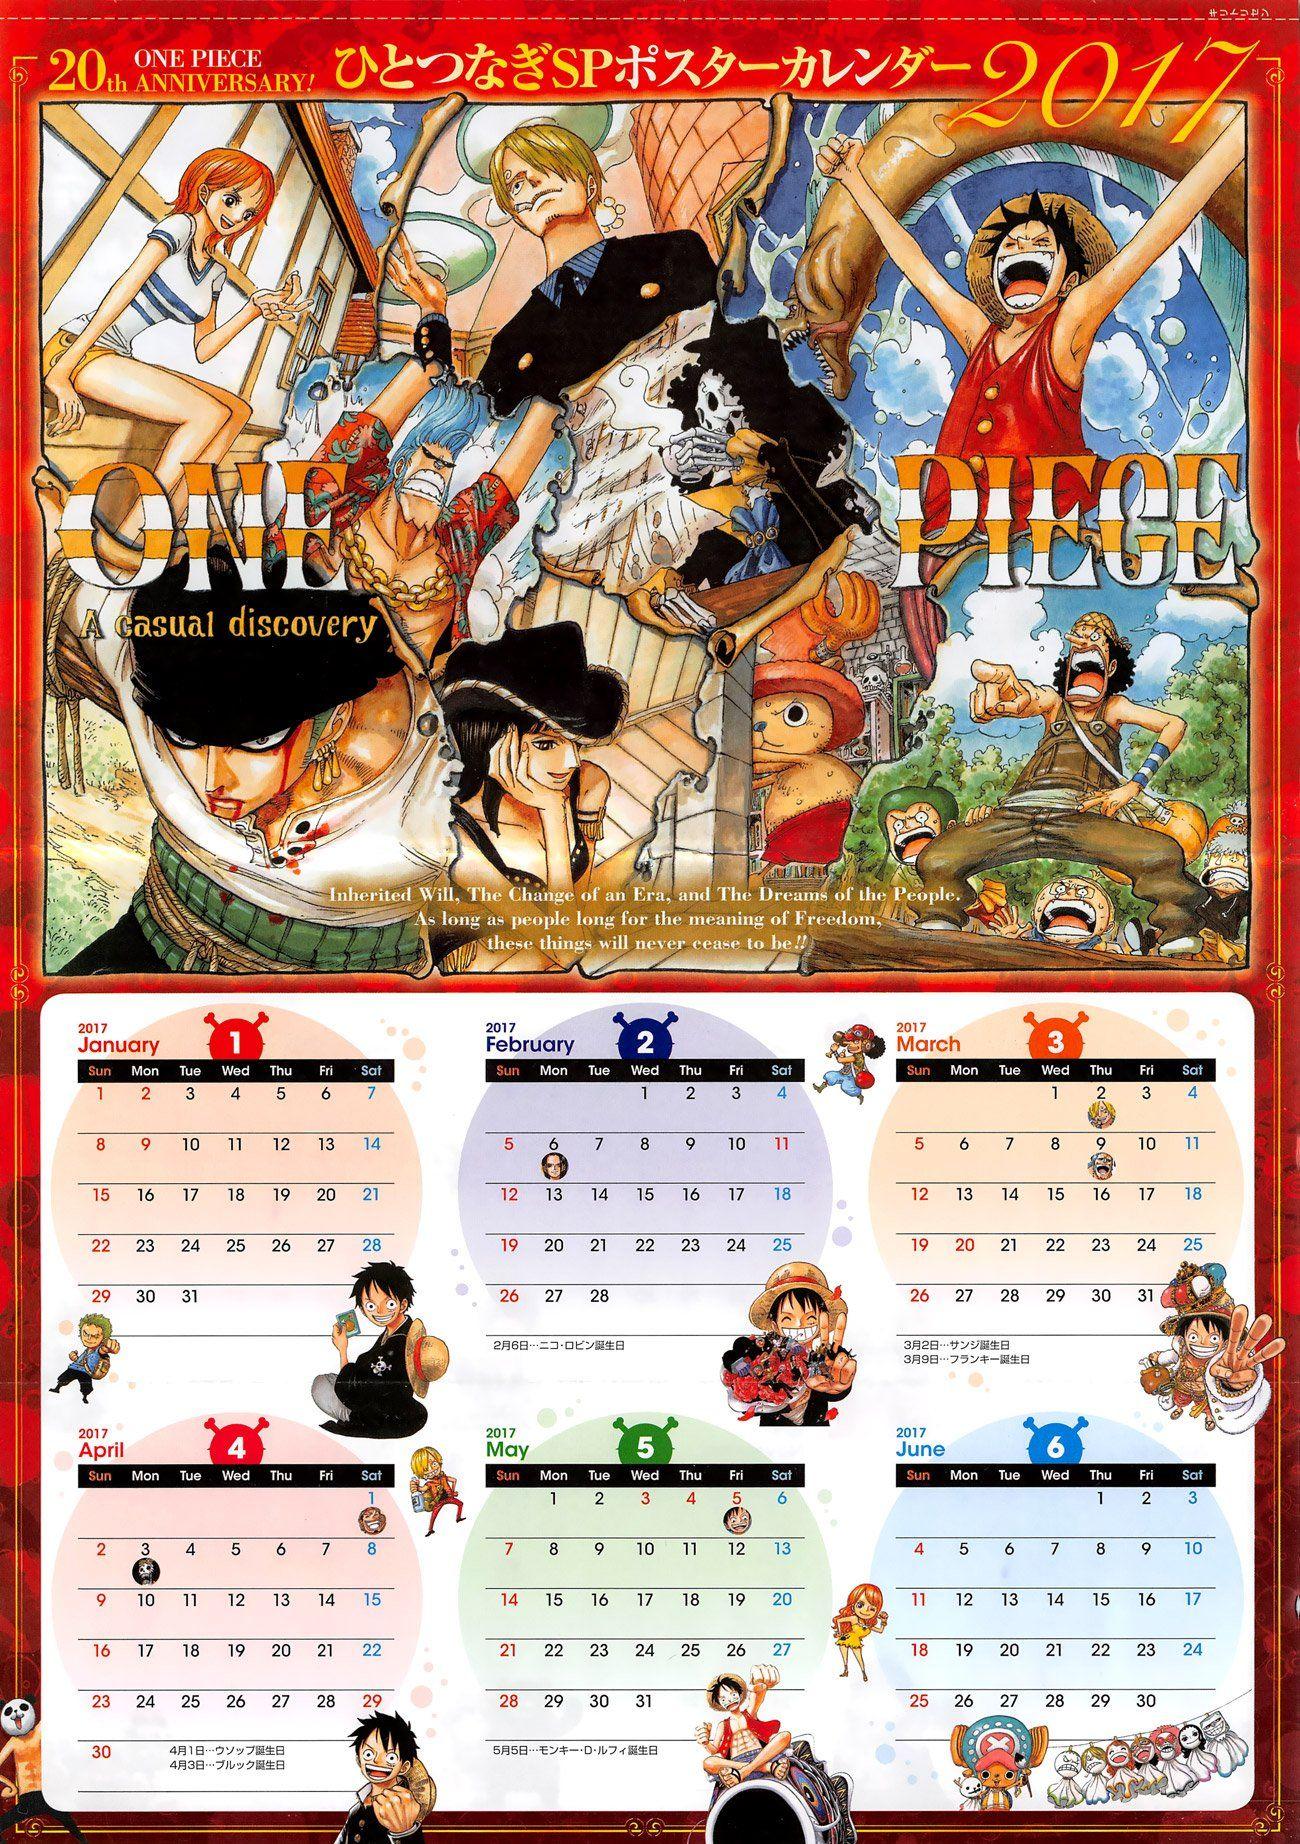 One Piece Calendar 2017 Bộ lịch One Piece cho năm mới